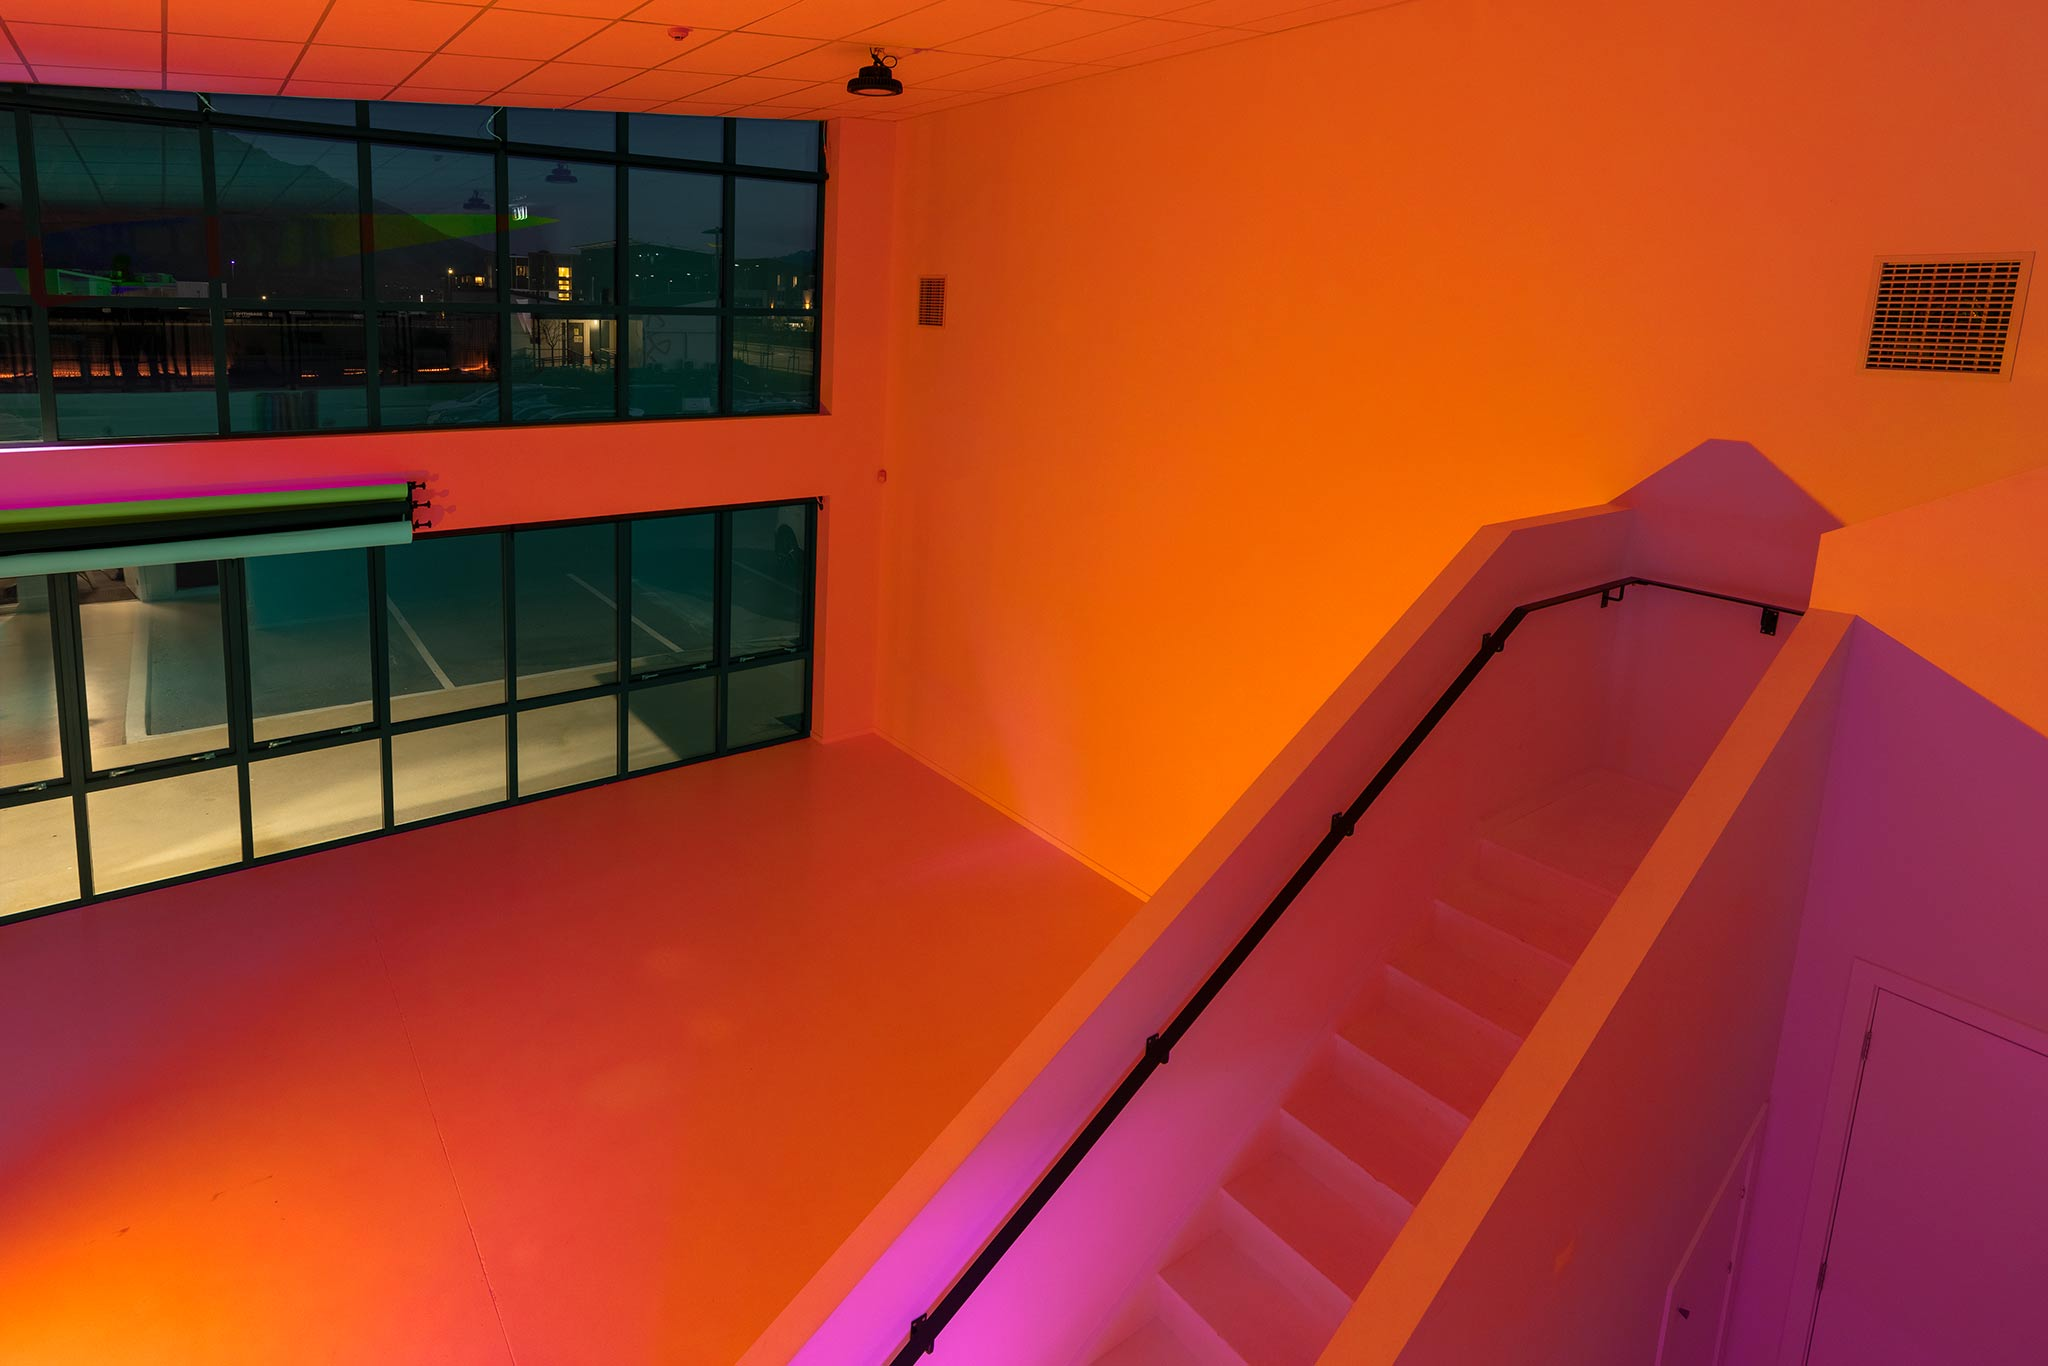 film-photo-studio-orange